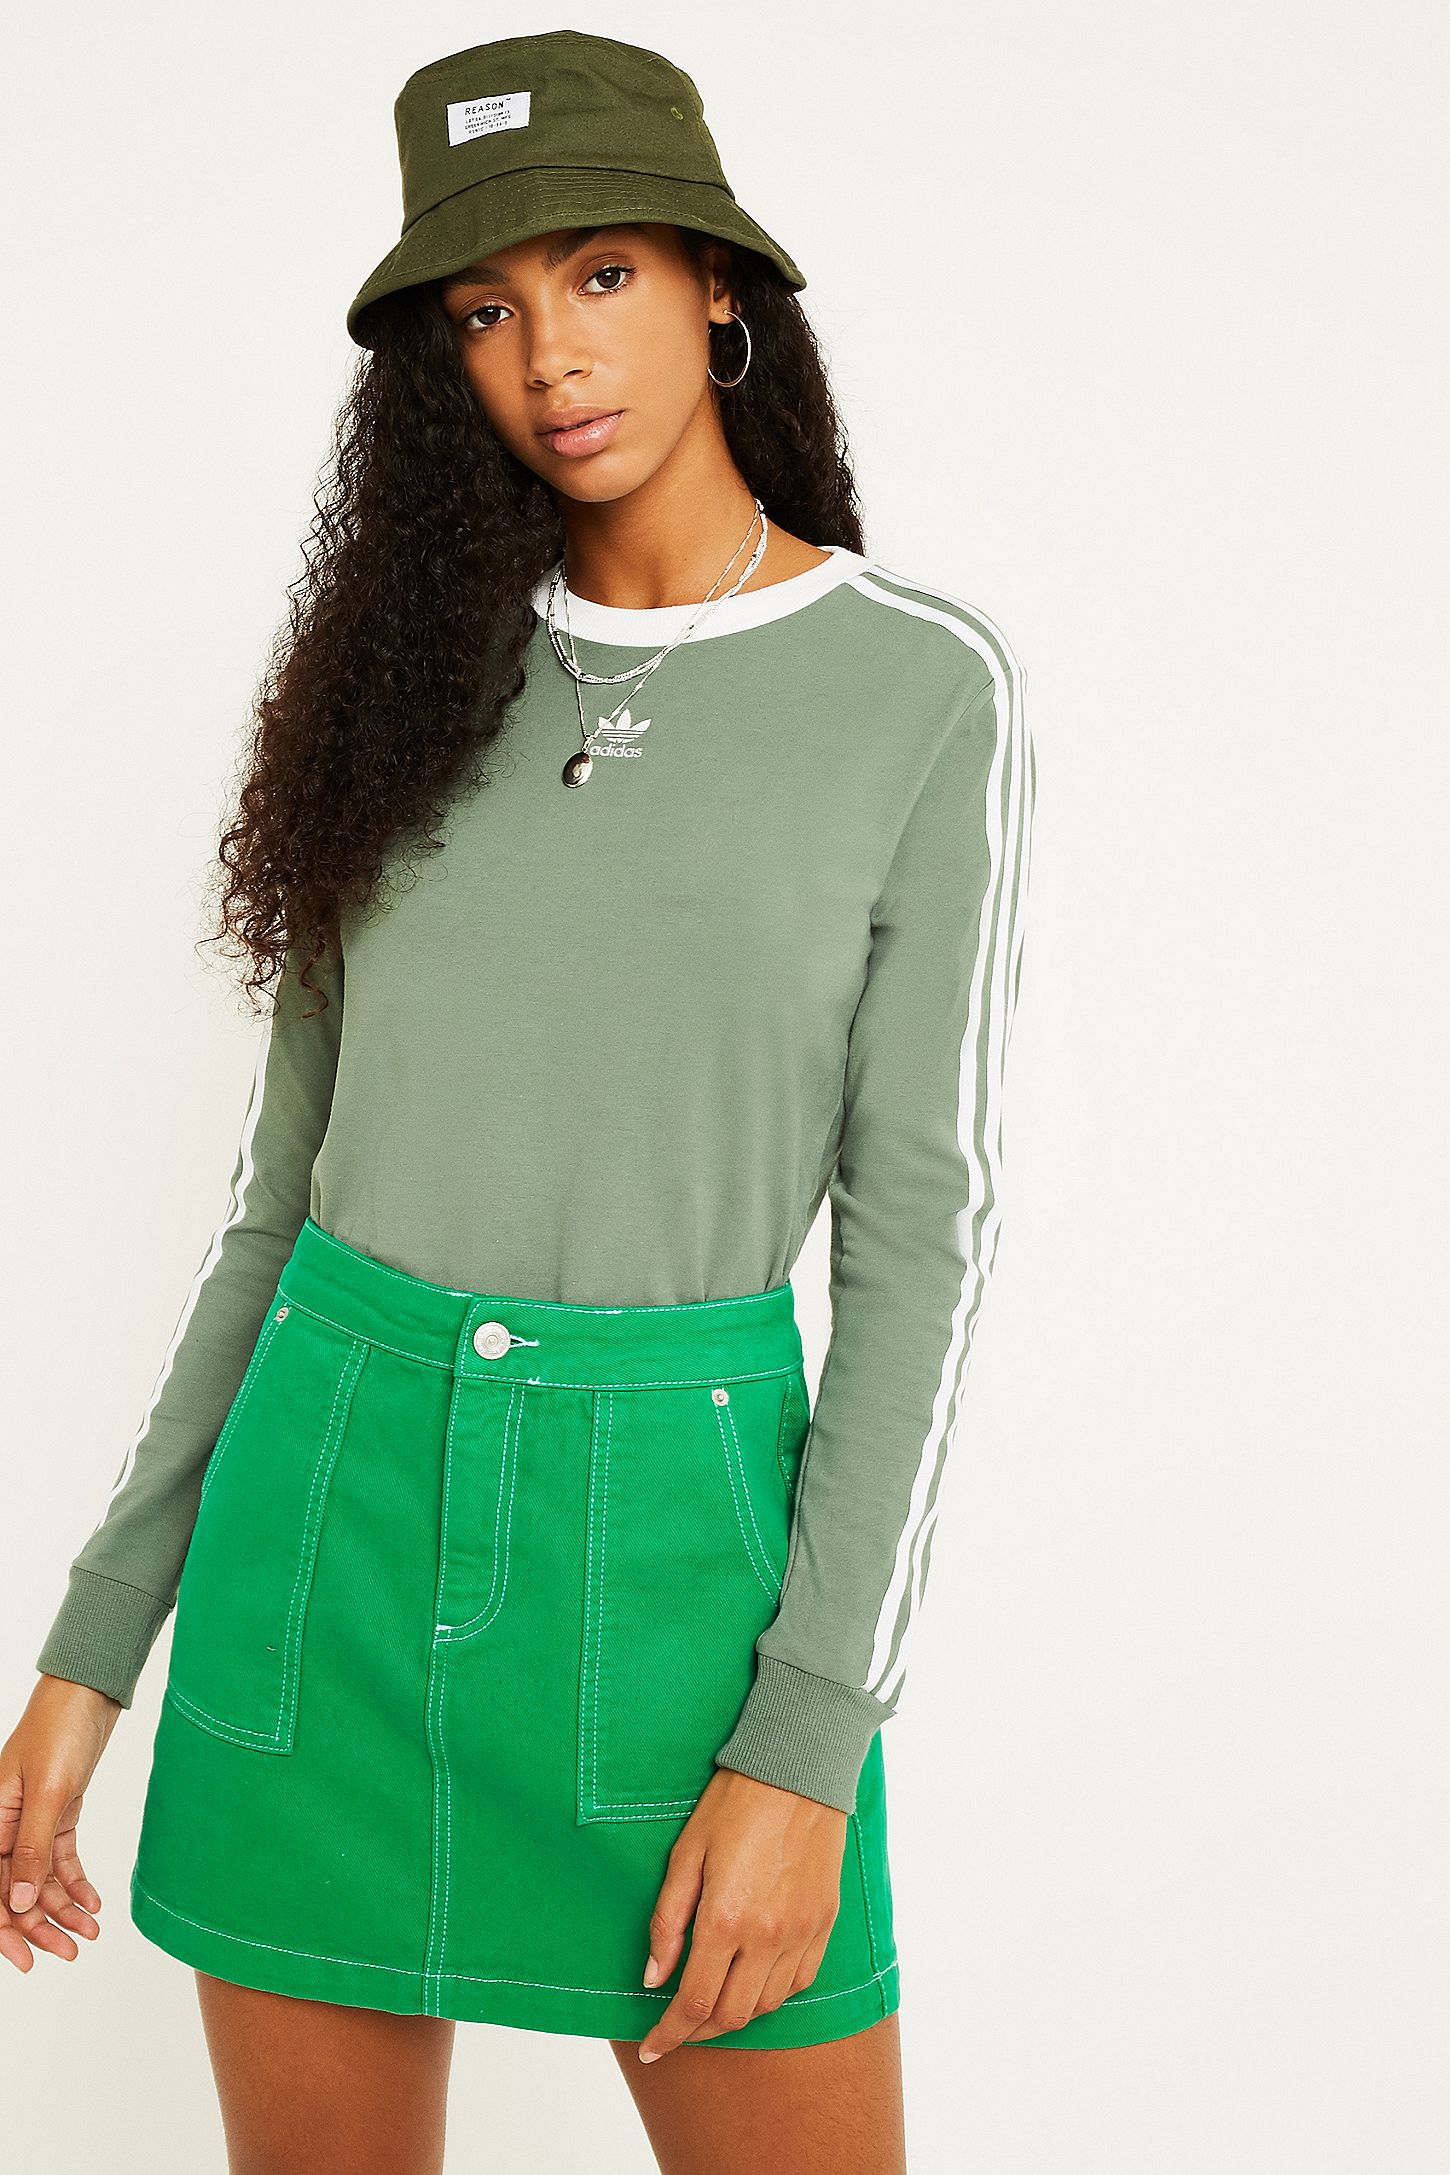 ef1c8656fe97c adidas Originals Khaki 3-Stripe Long-Sleeve T-Shirt | Urban ...